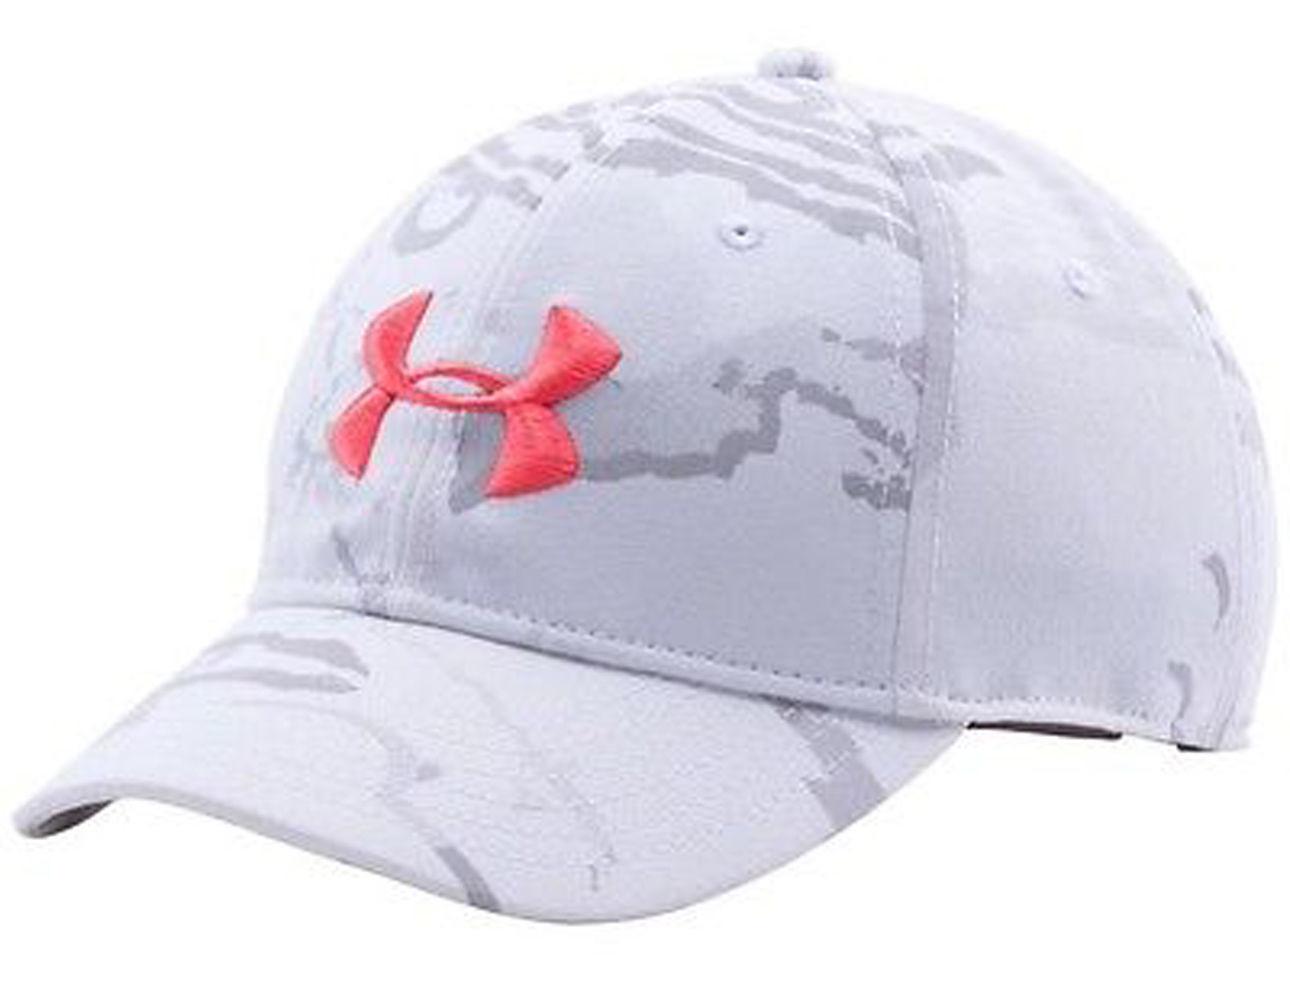 Under Armour Women's Ridge Reaper Snow Camo/Perfection UA Snap Back Cap